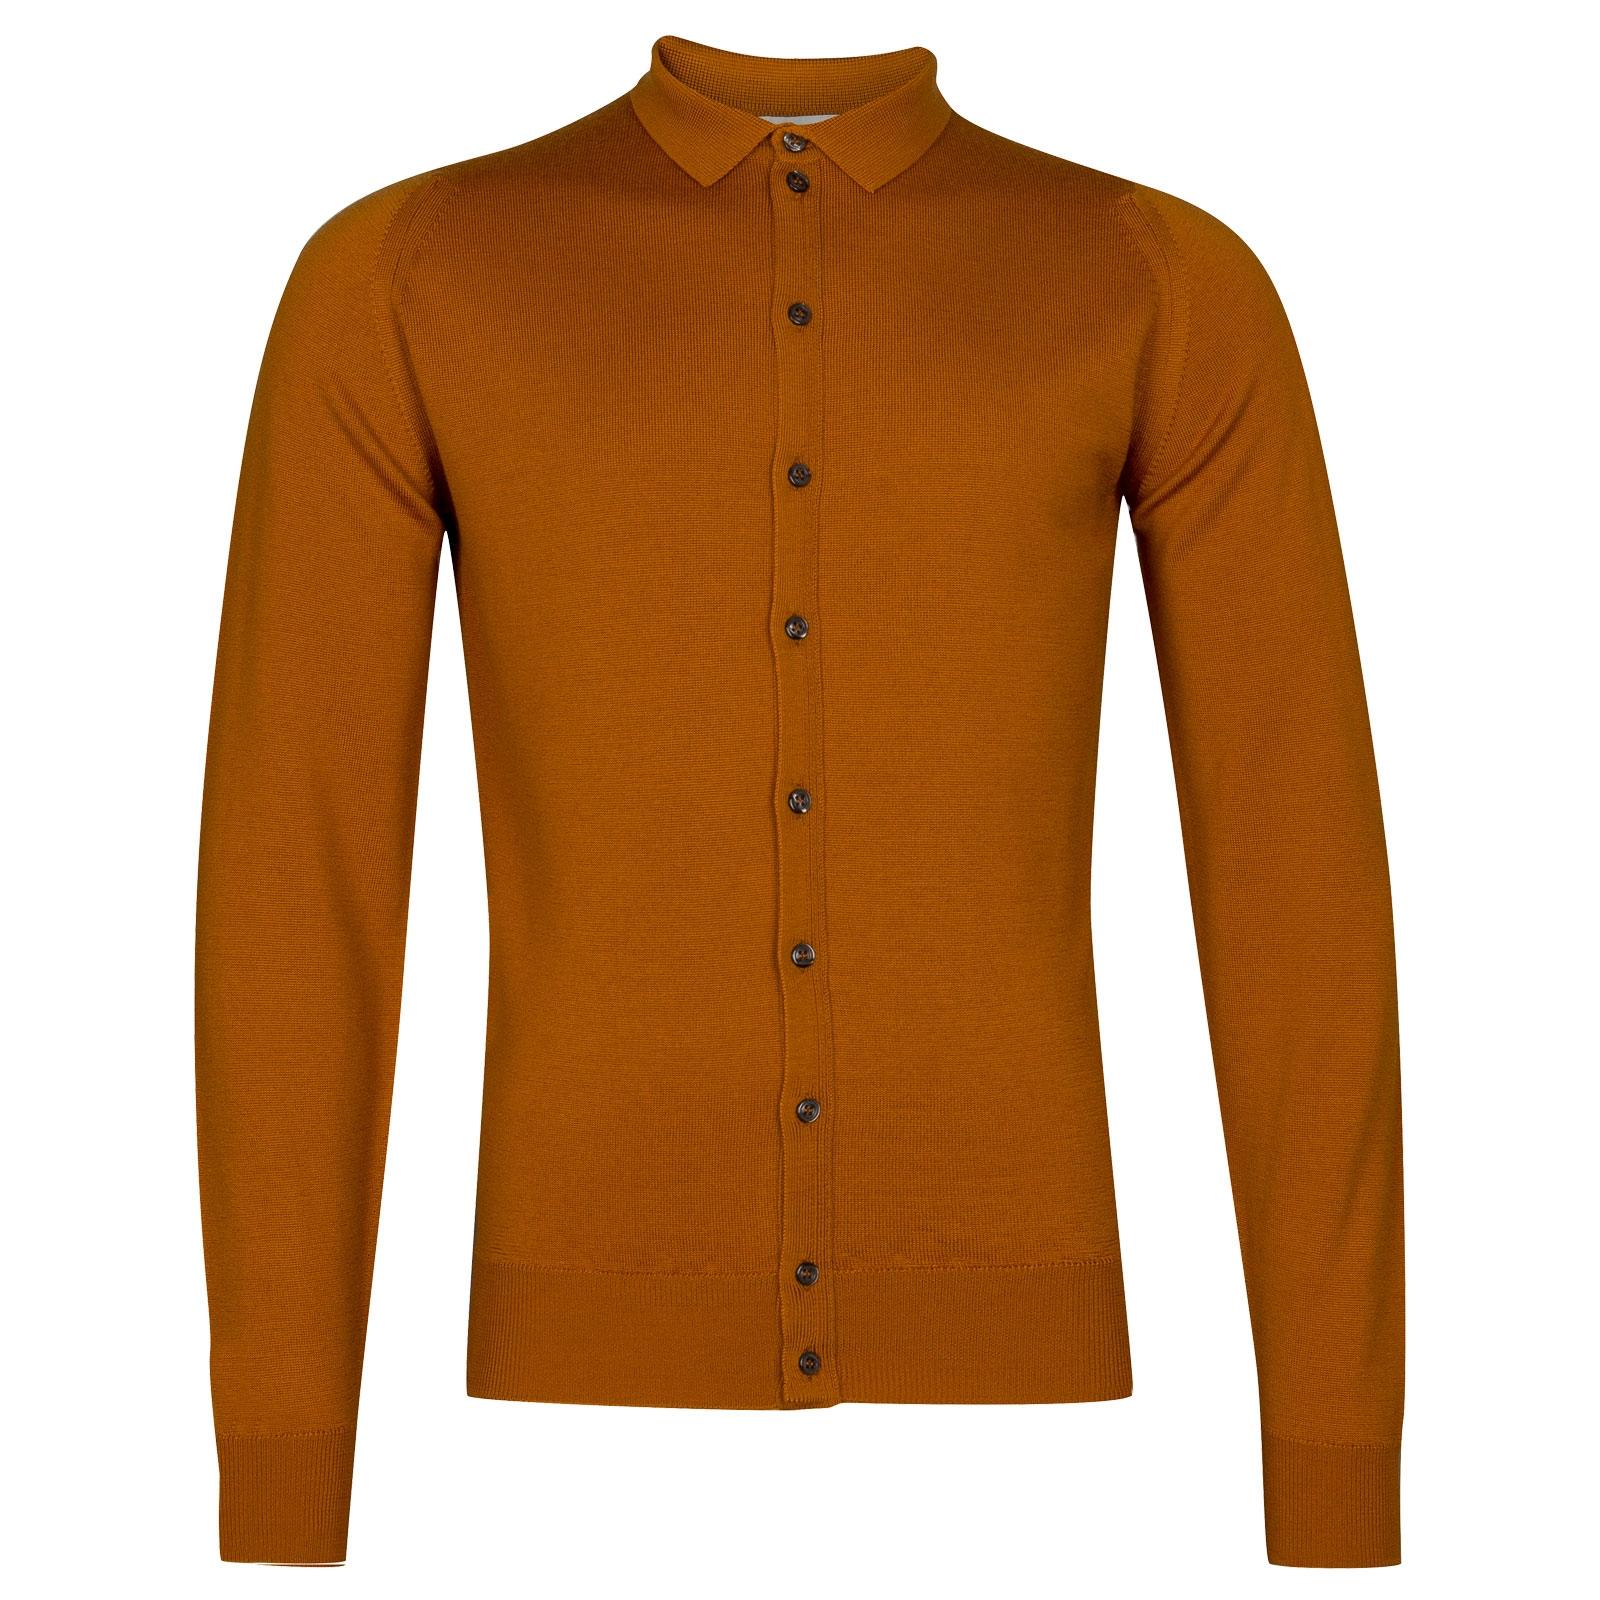 John Smedley Parwish Merino Wool Shirt in Bronze-L